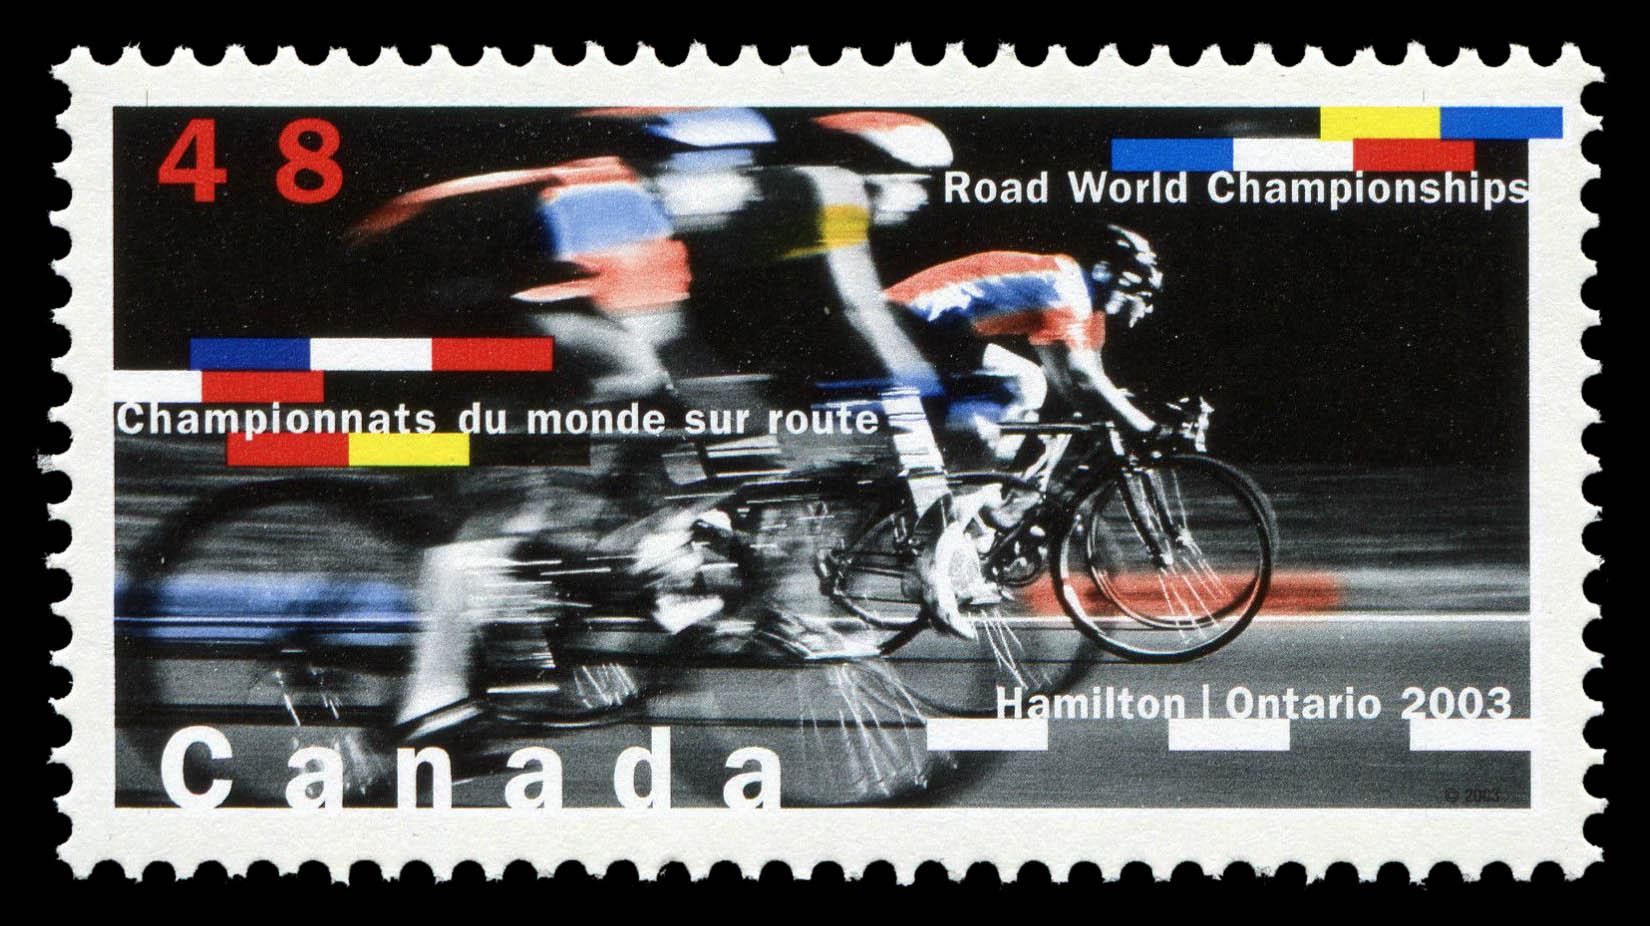 Road World Championships, Hamilton, Ontario, 2003 Canada Postage Stamp